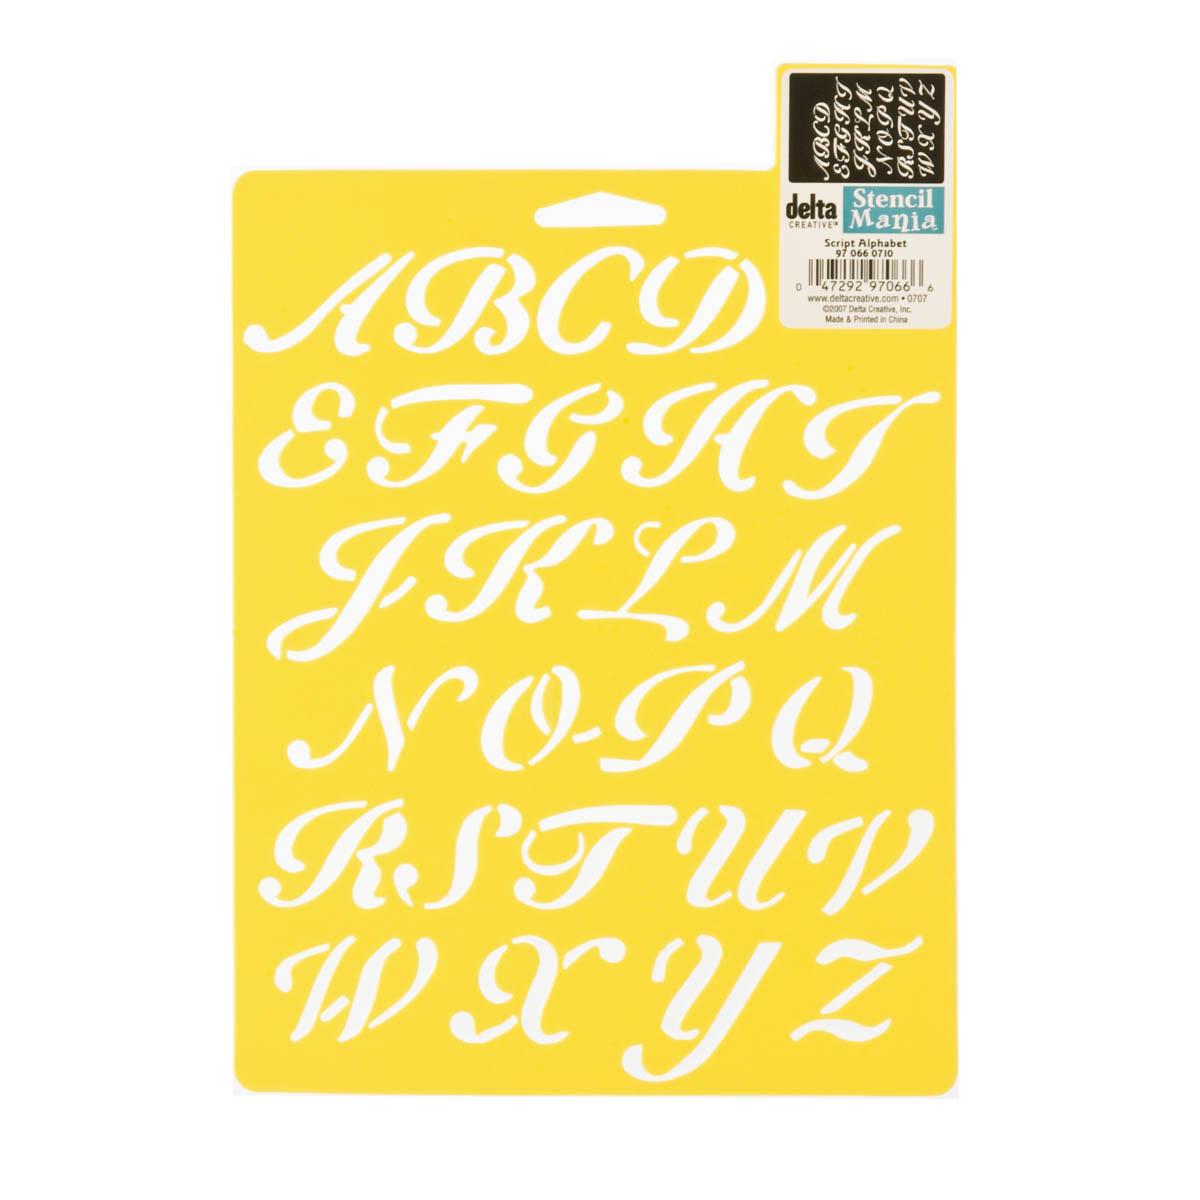 Delta Stencil Mania™ - Alphabet - Script - 970660710